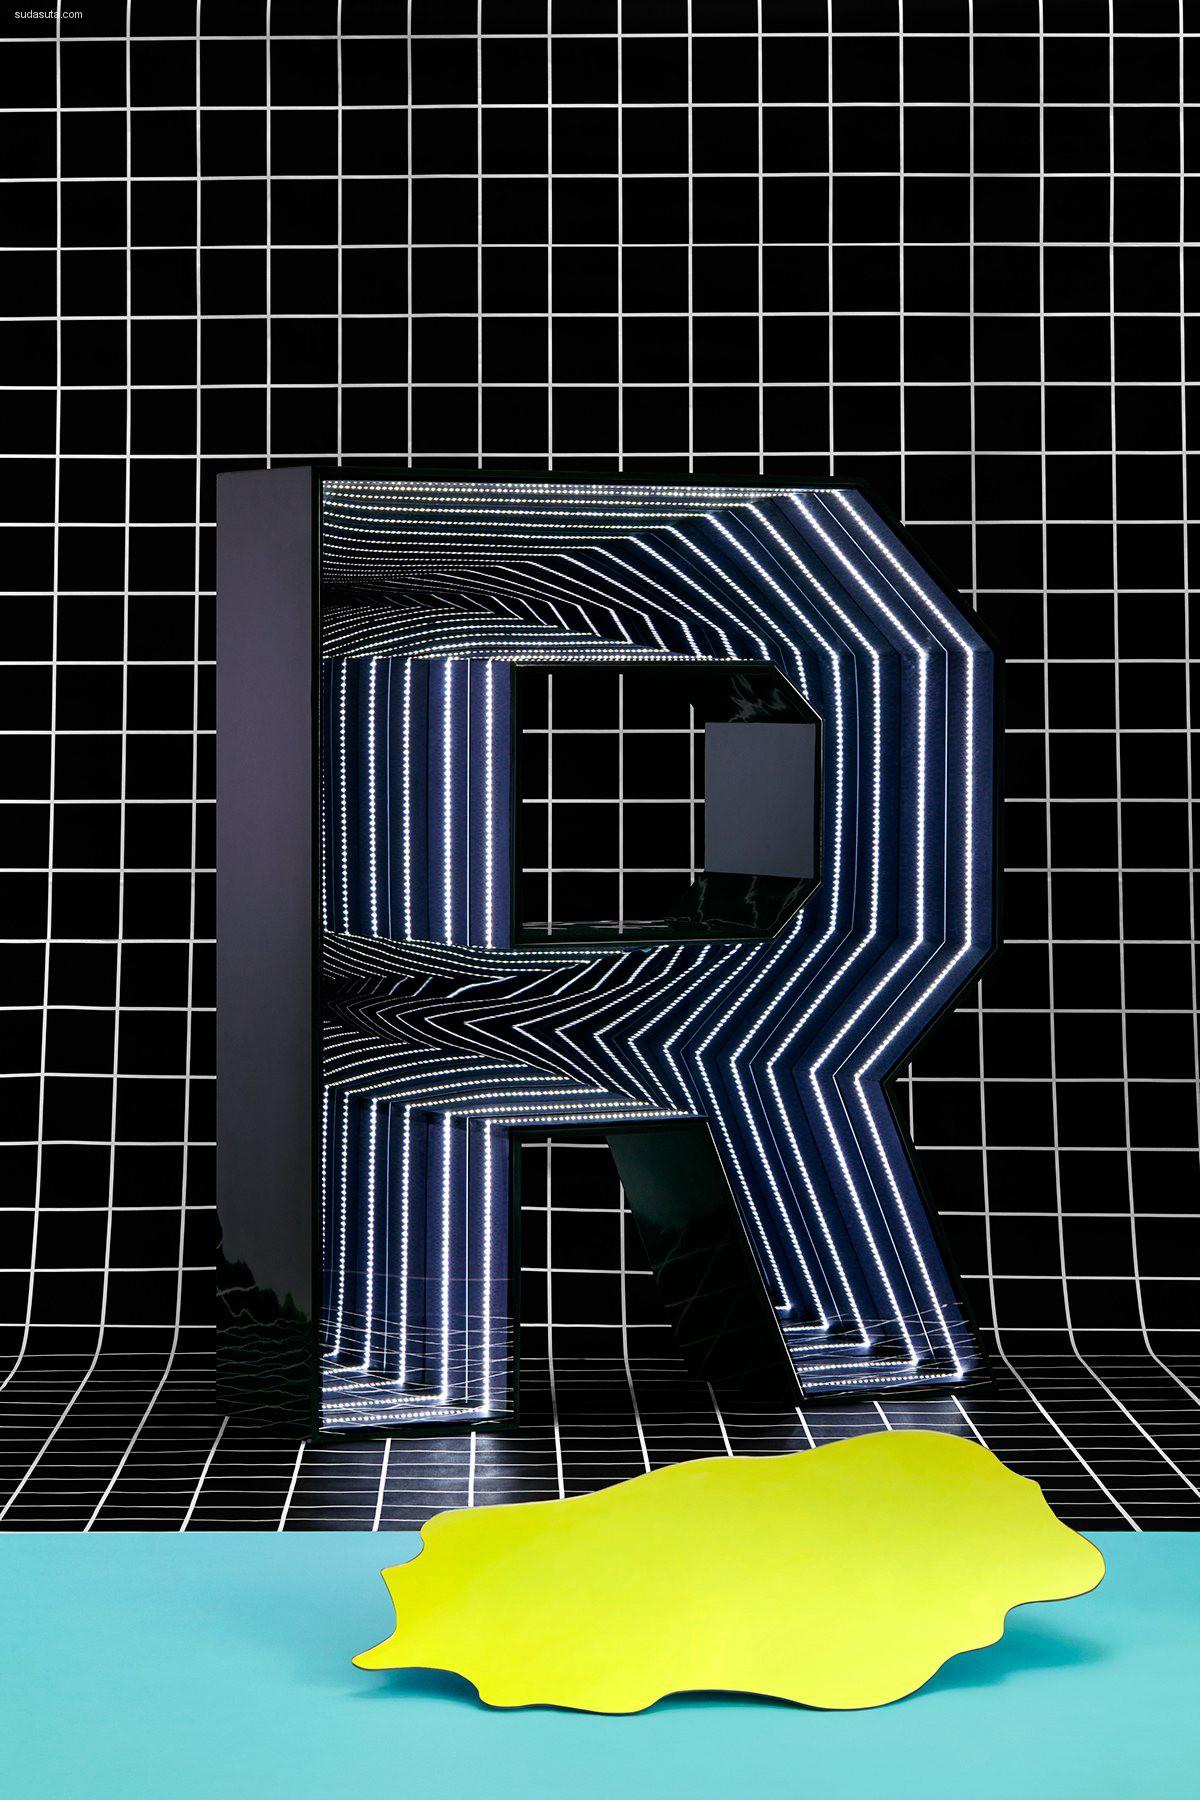 Mathieu Lévesque 广告机平面设计欣赏